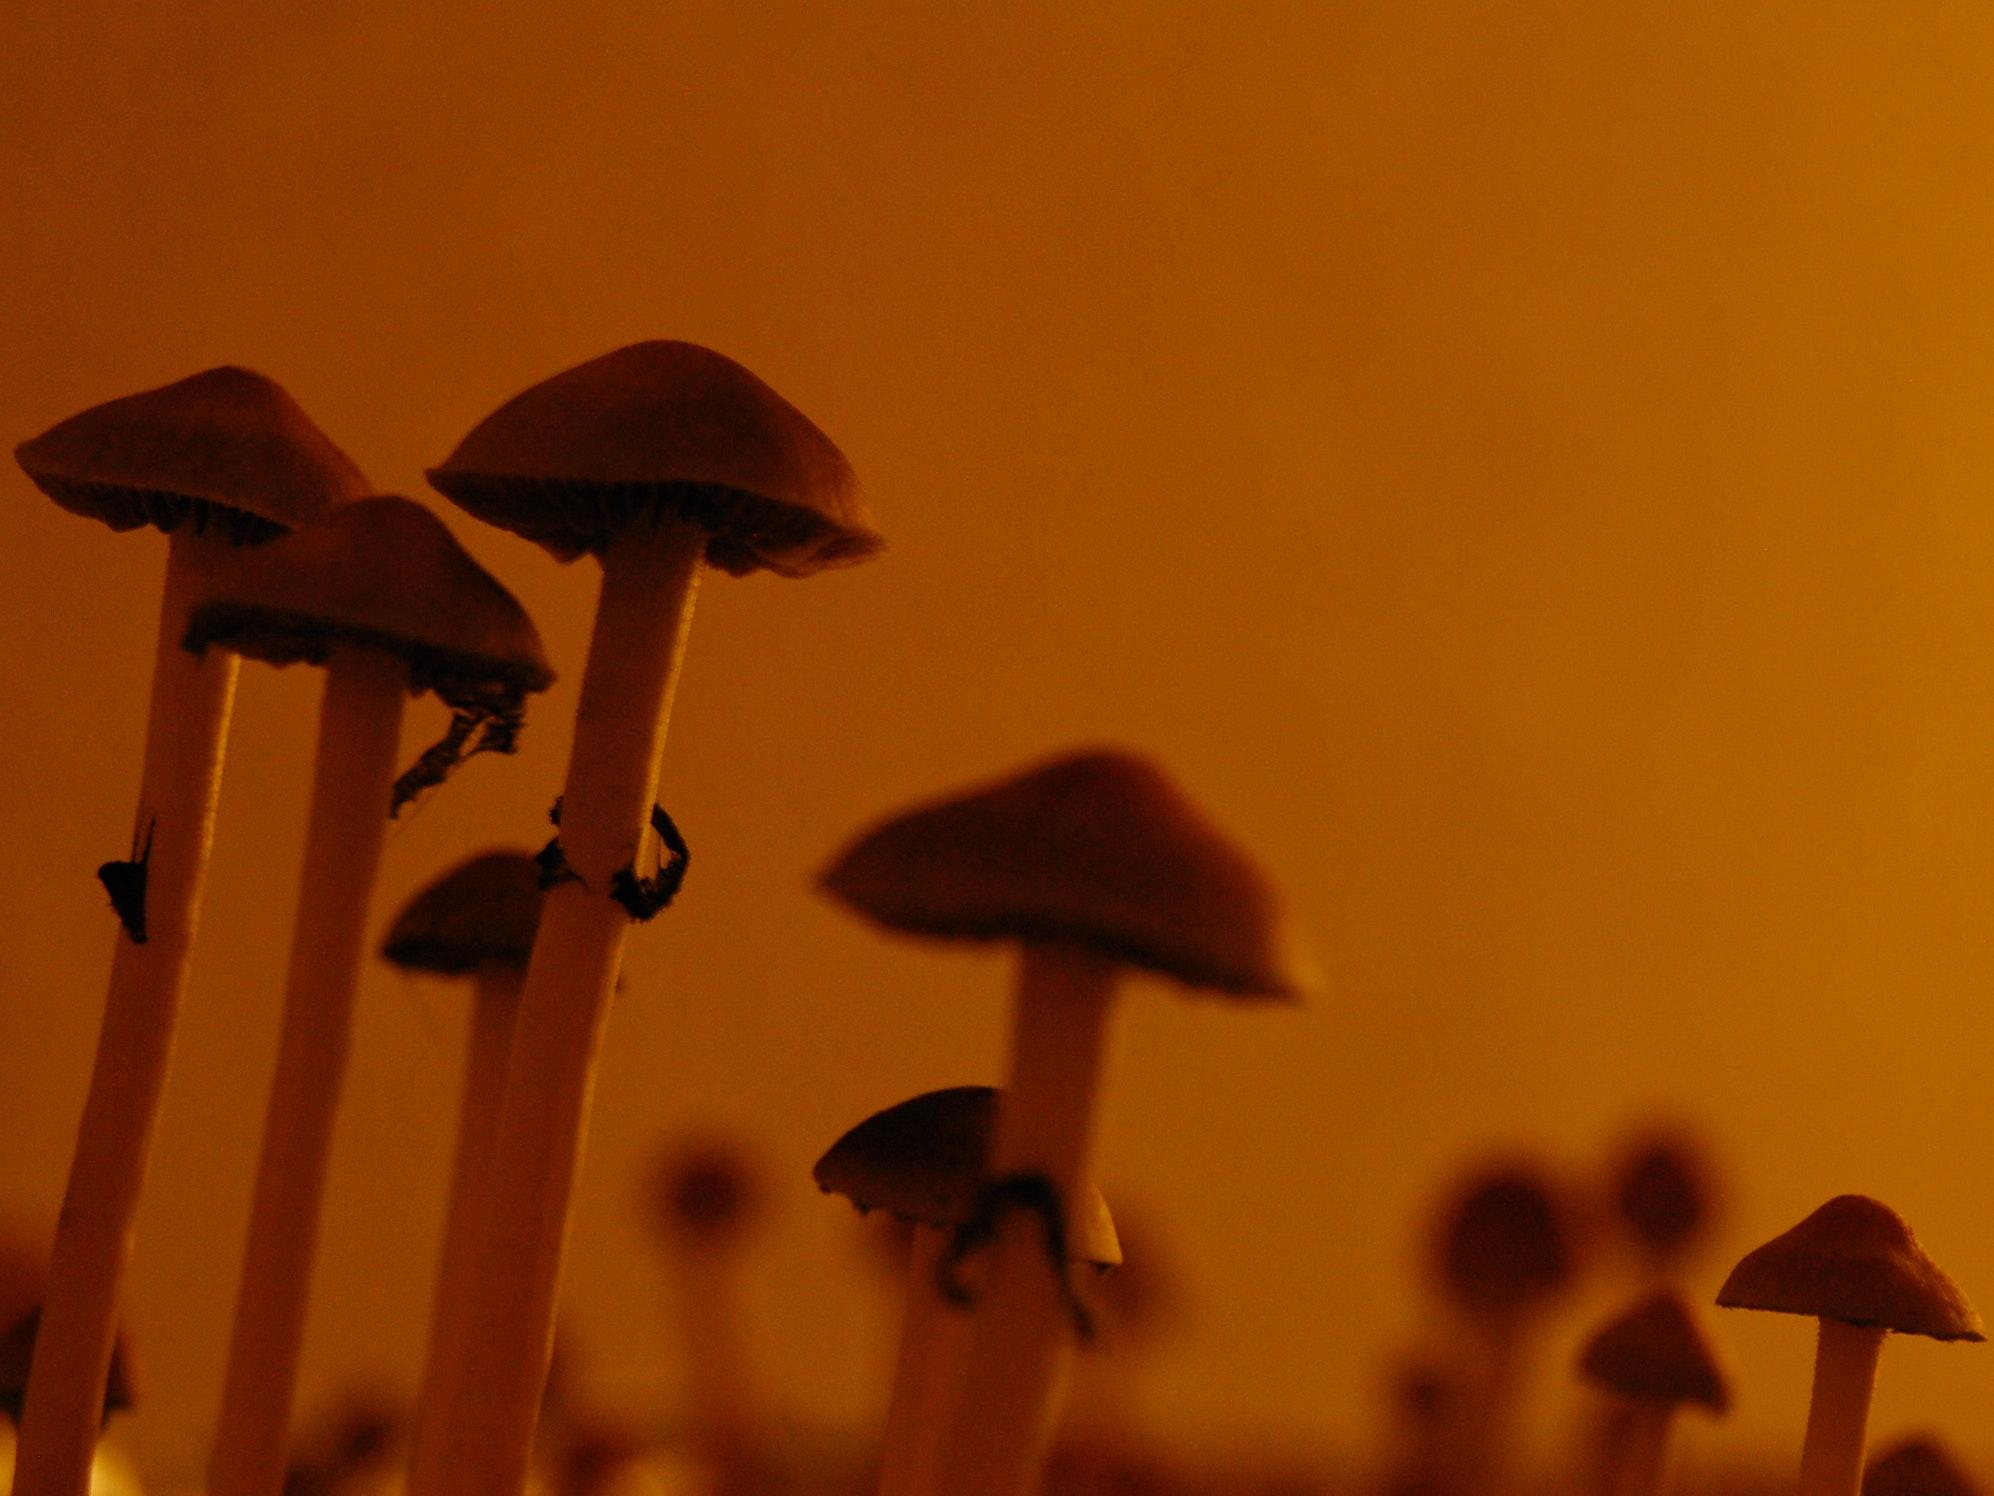 The Latest Prescription Psychedelics Idea? Treat Addiction With Magic Mushrooms